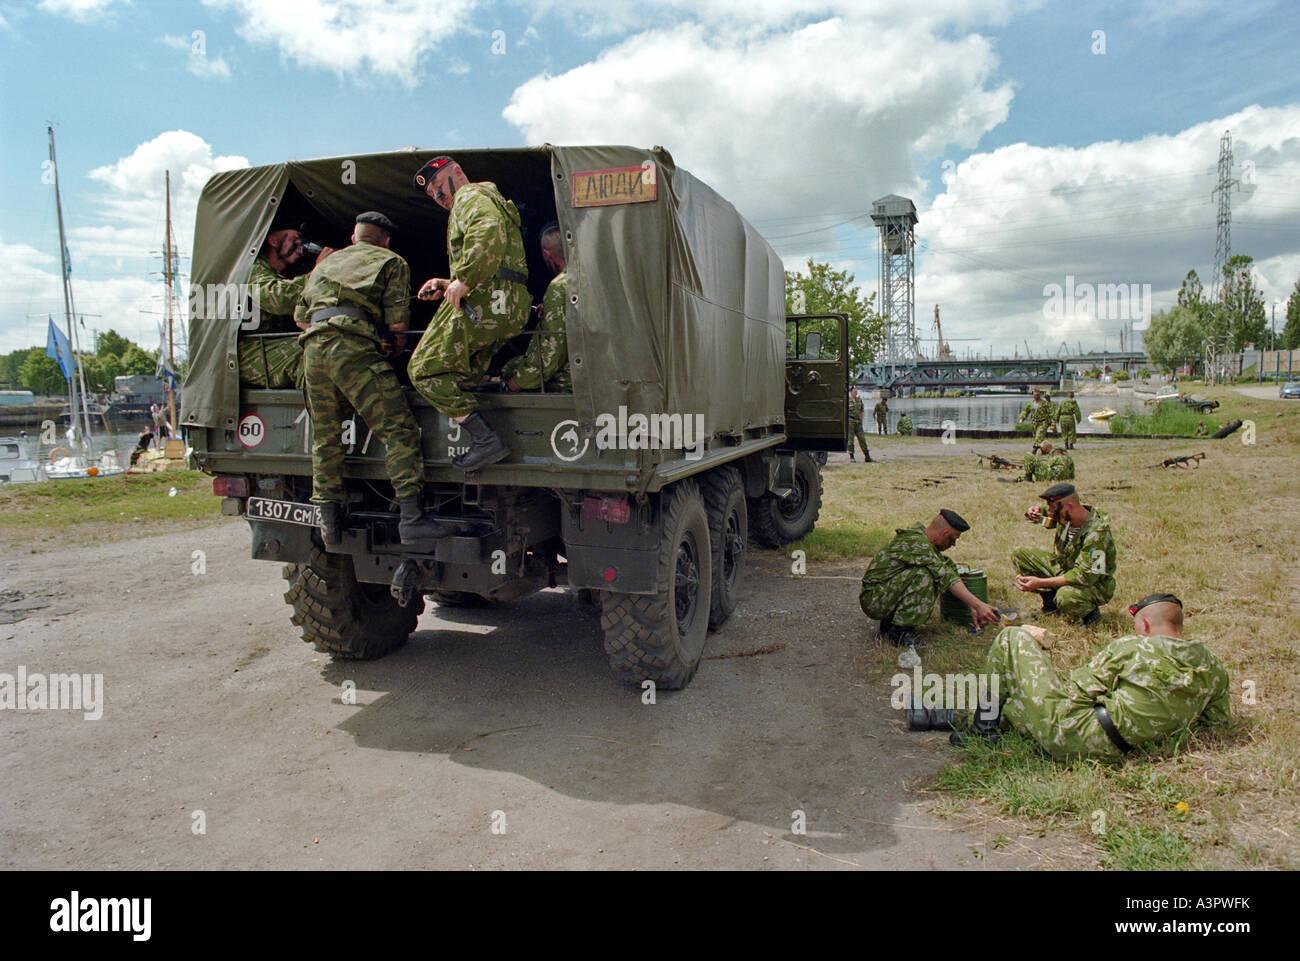 La marine russe de Kaliningrad, Russie, Photo Stock